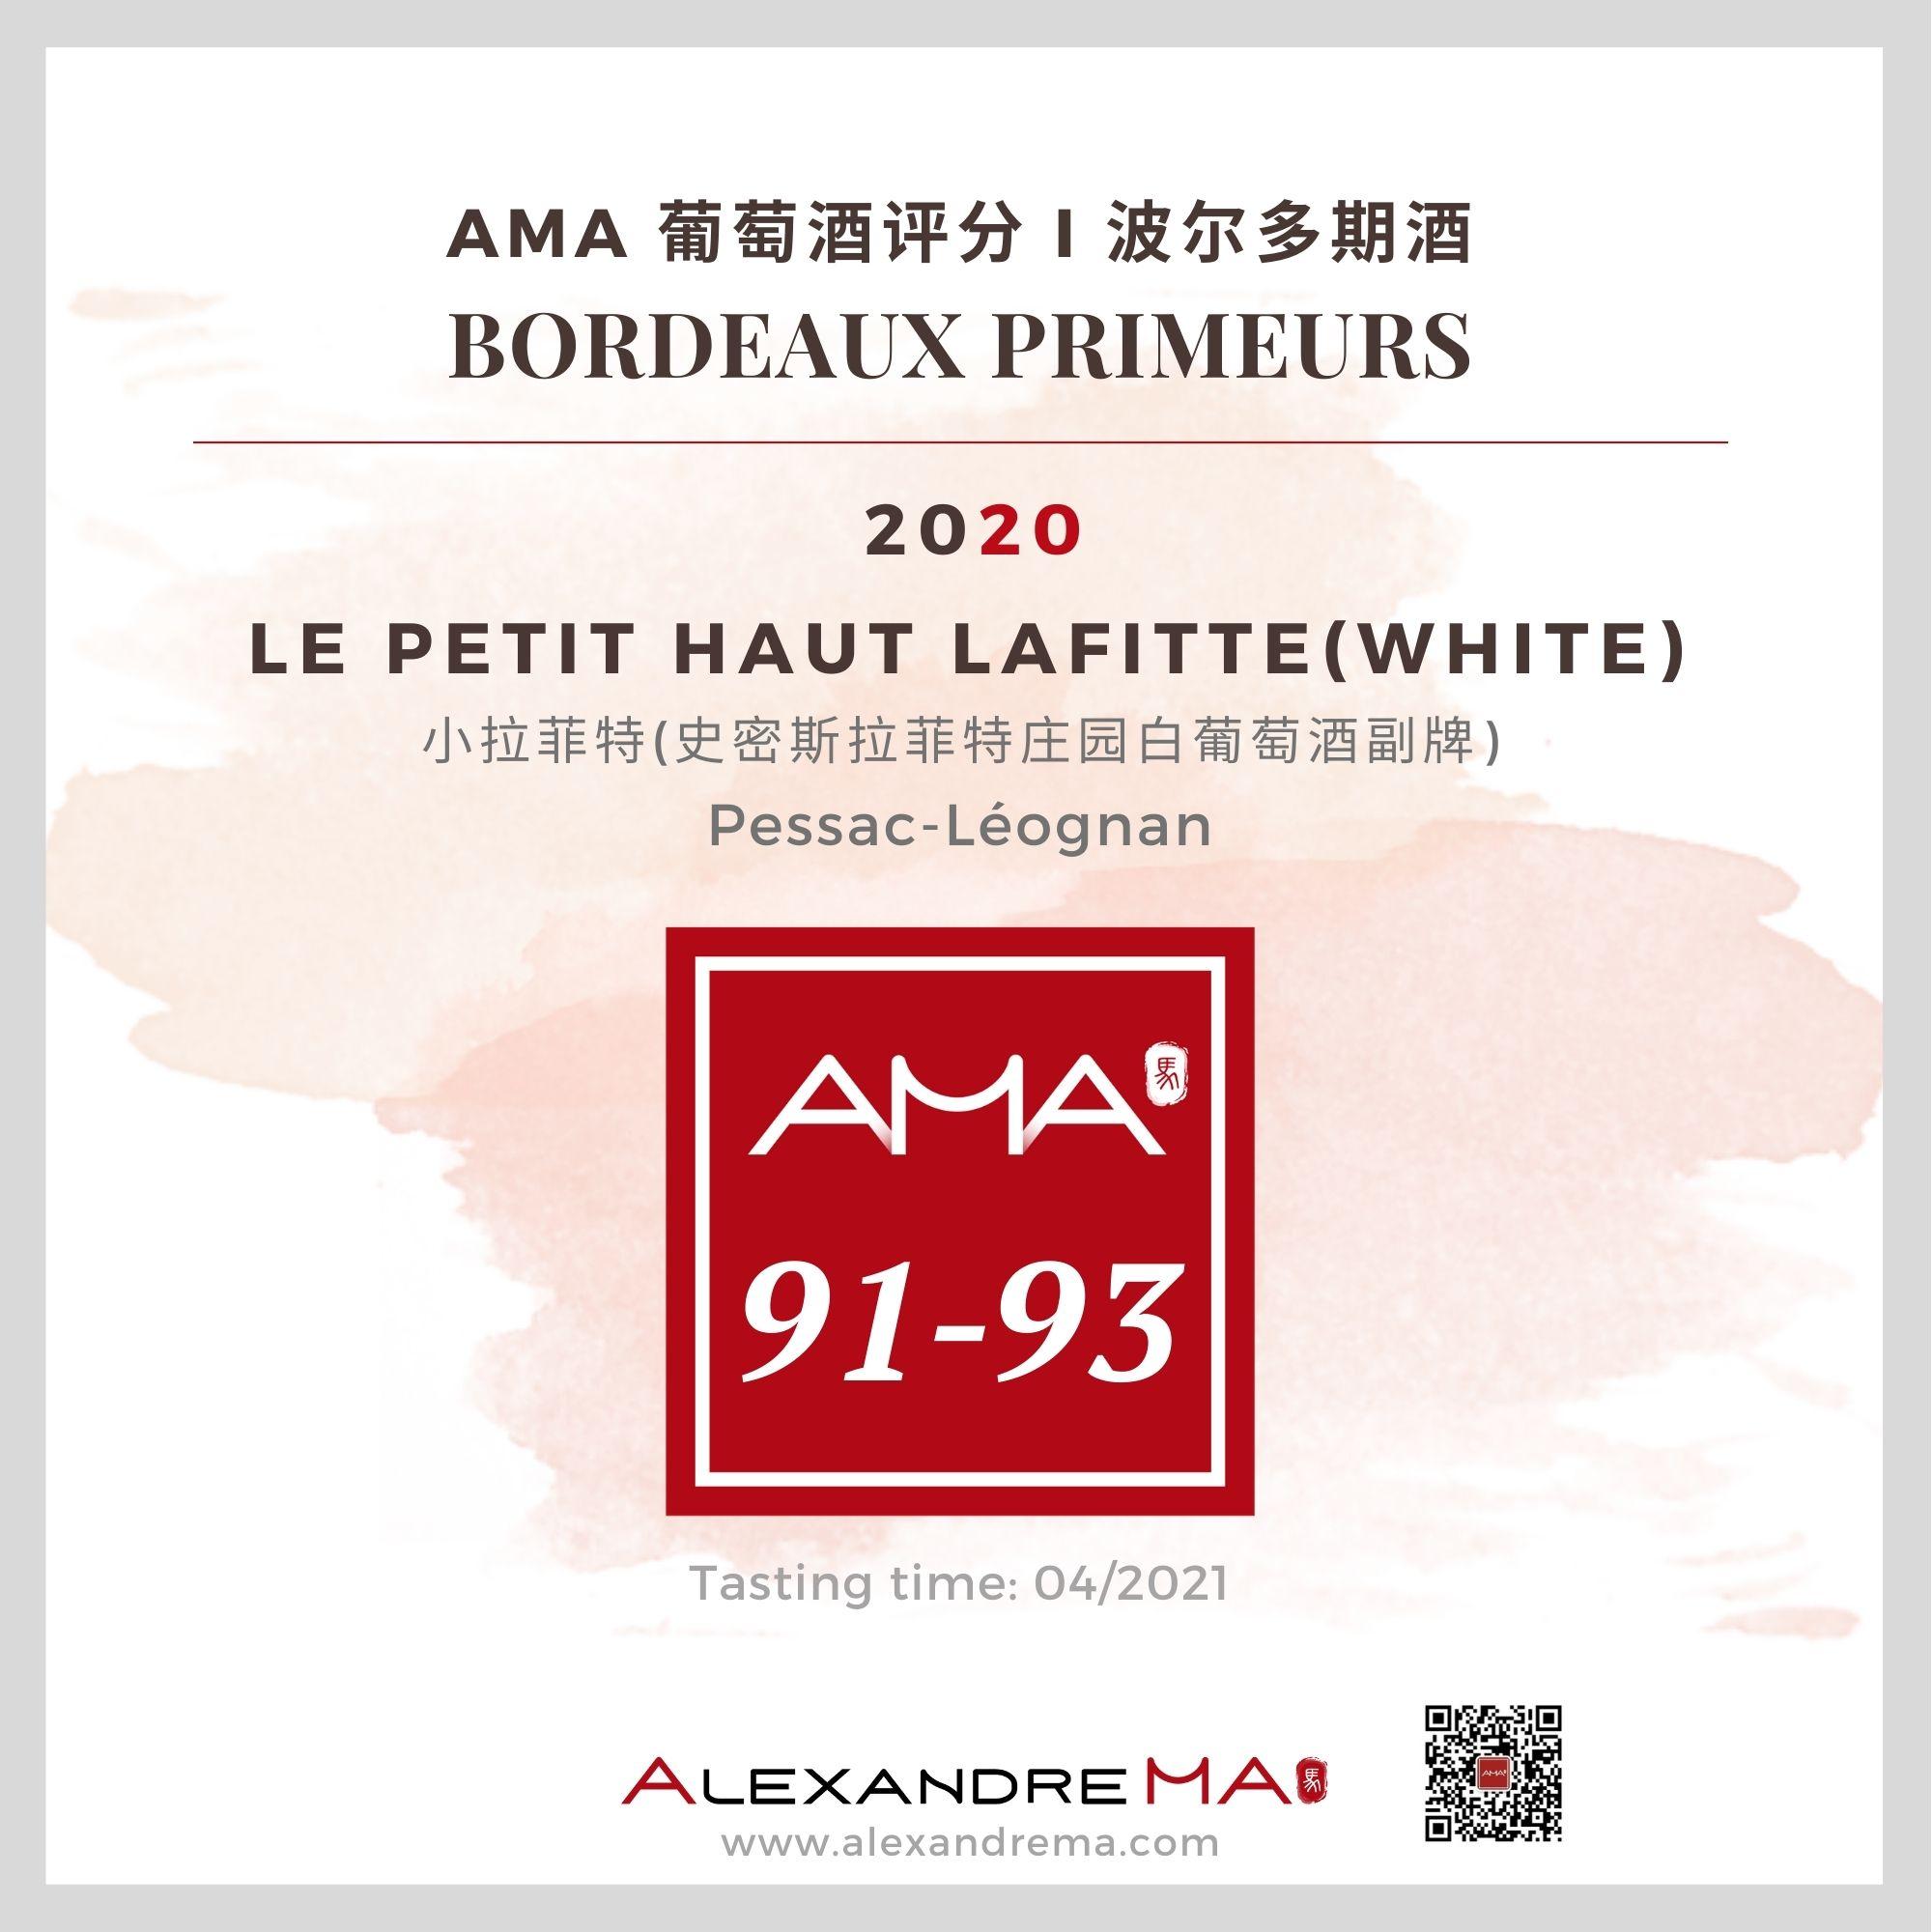 Château Smith Haut Lafitte – Le Petit Haut Lafitte White 2020 小拉菲特 - Alexandre Ma